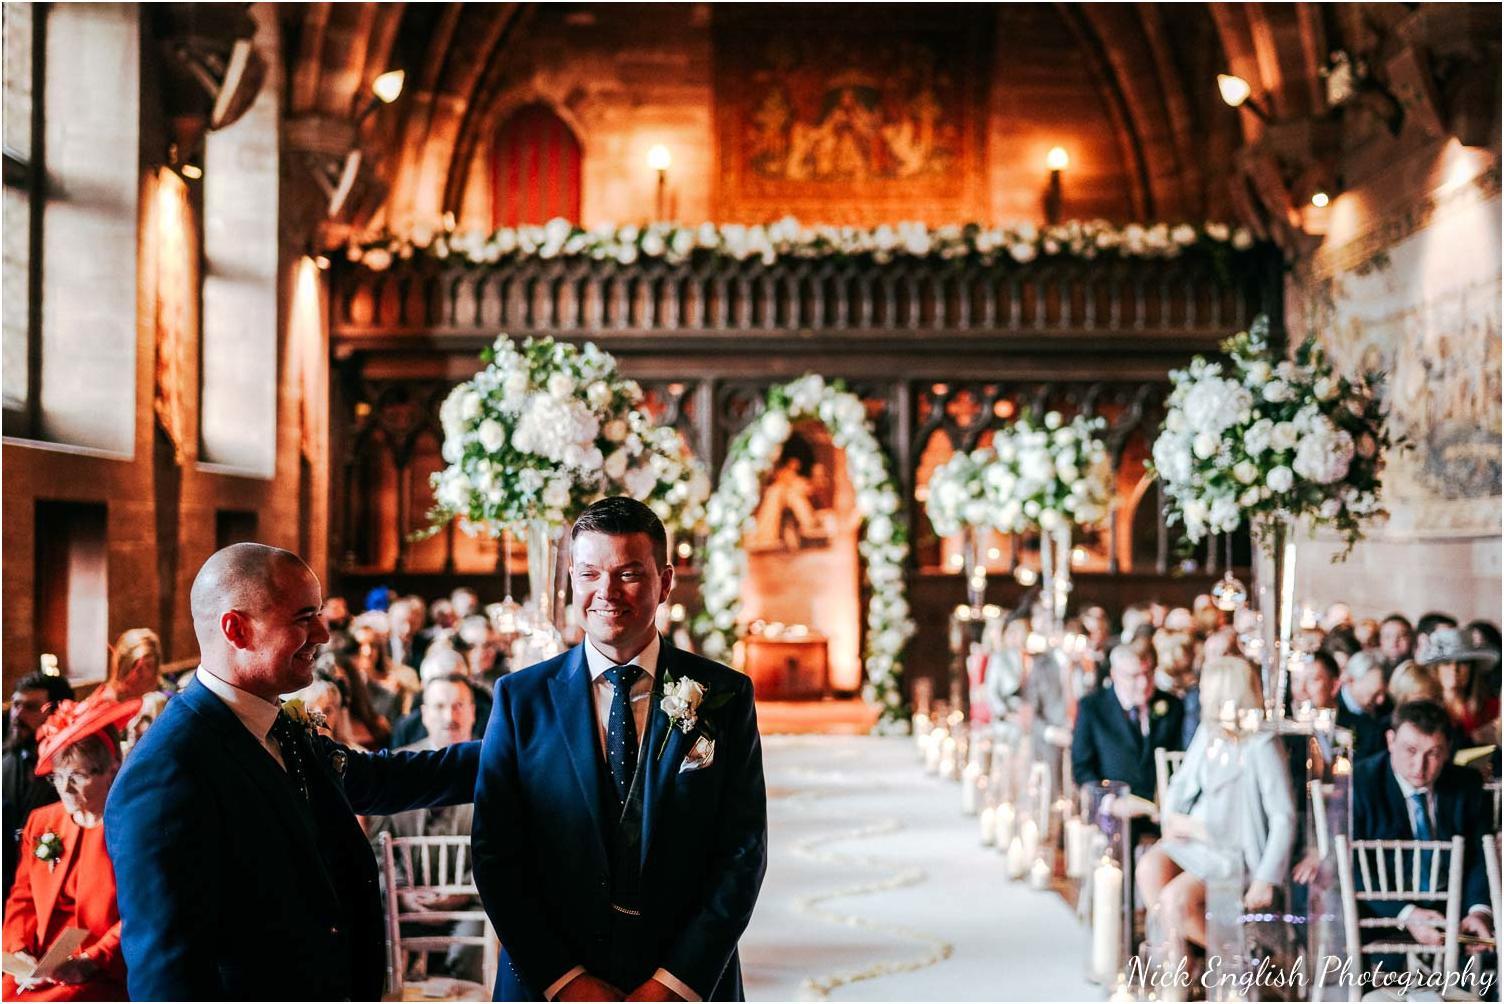 Peckforton_Castle_Winter_Wedding-25.jpg